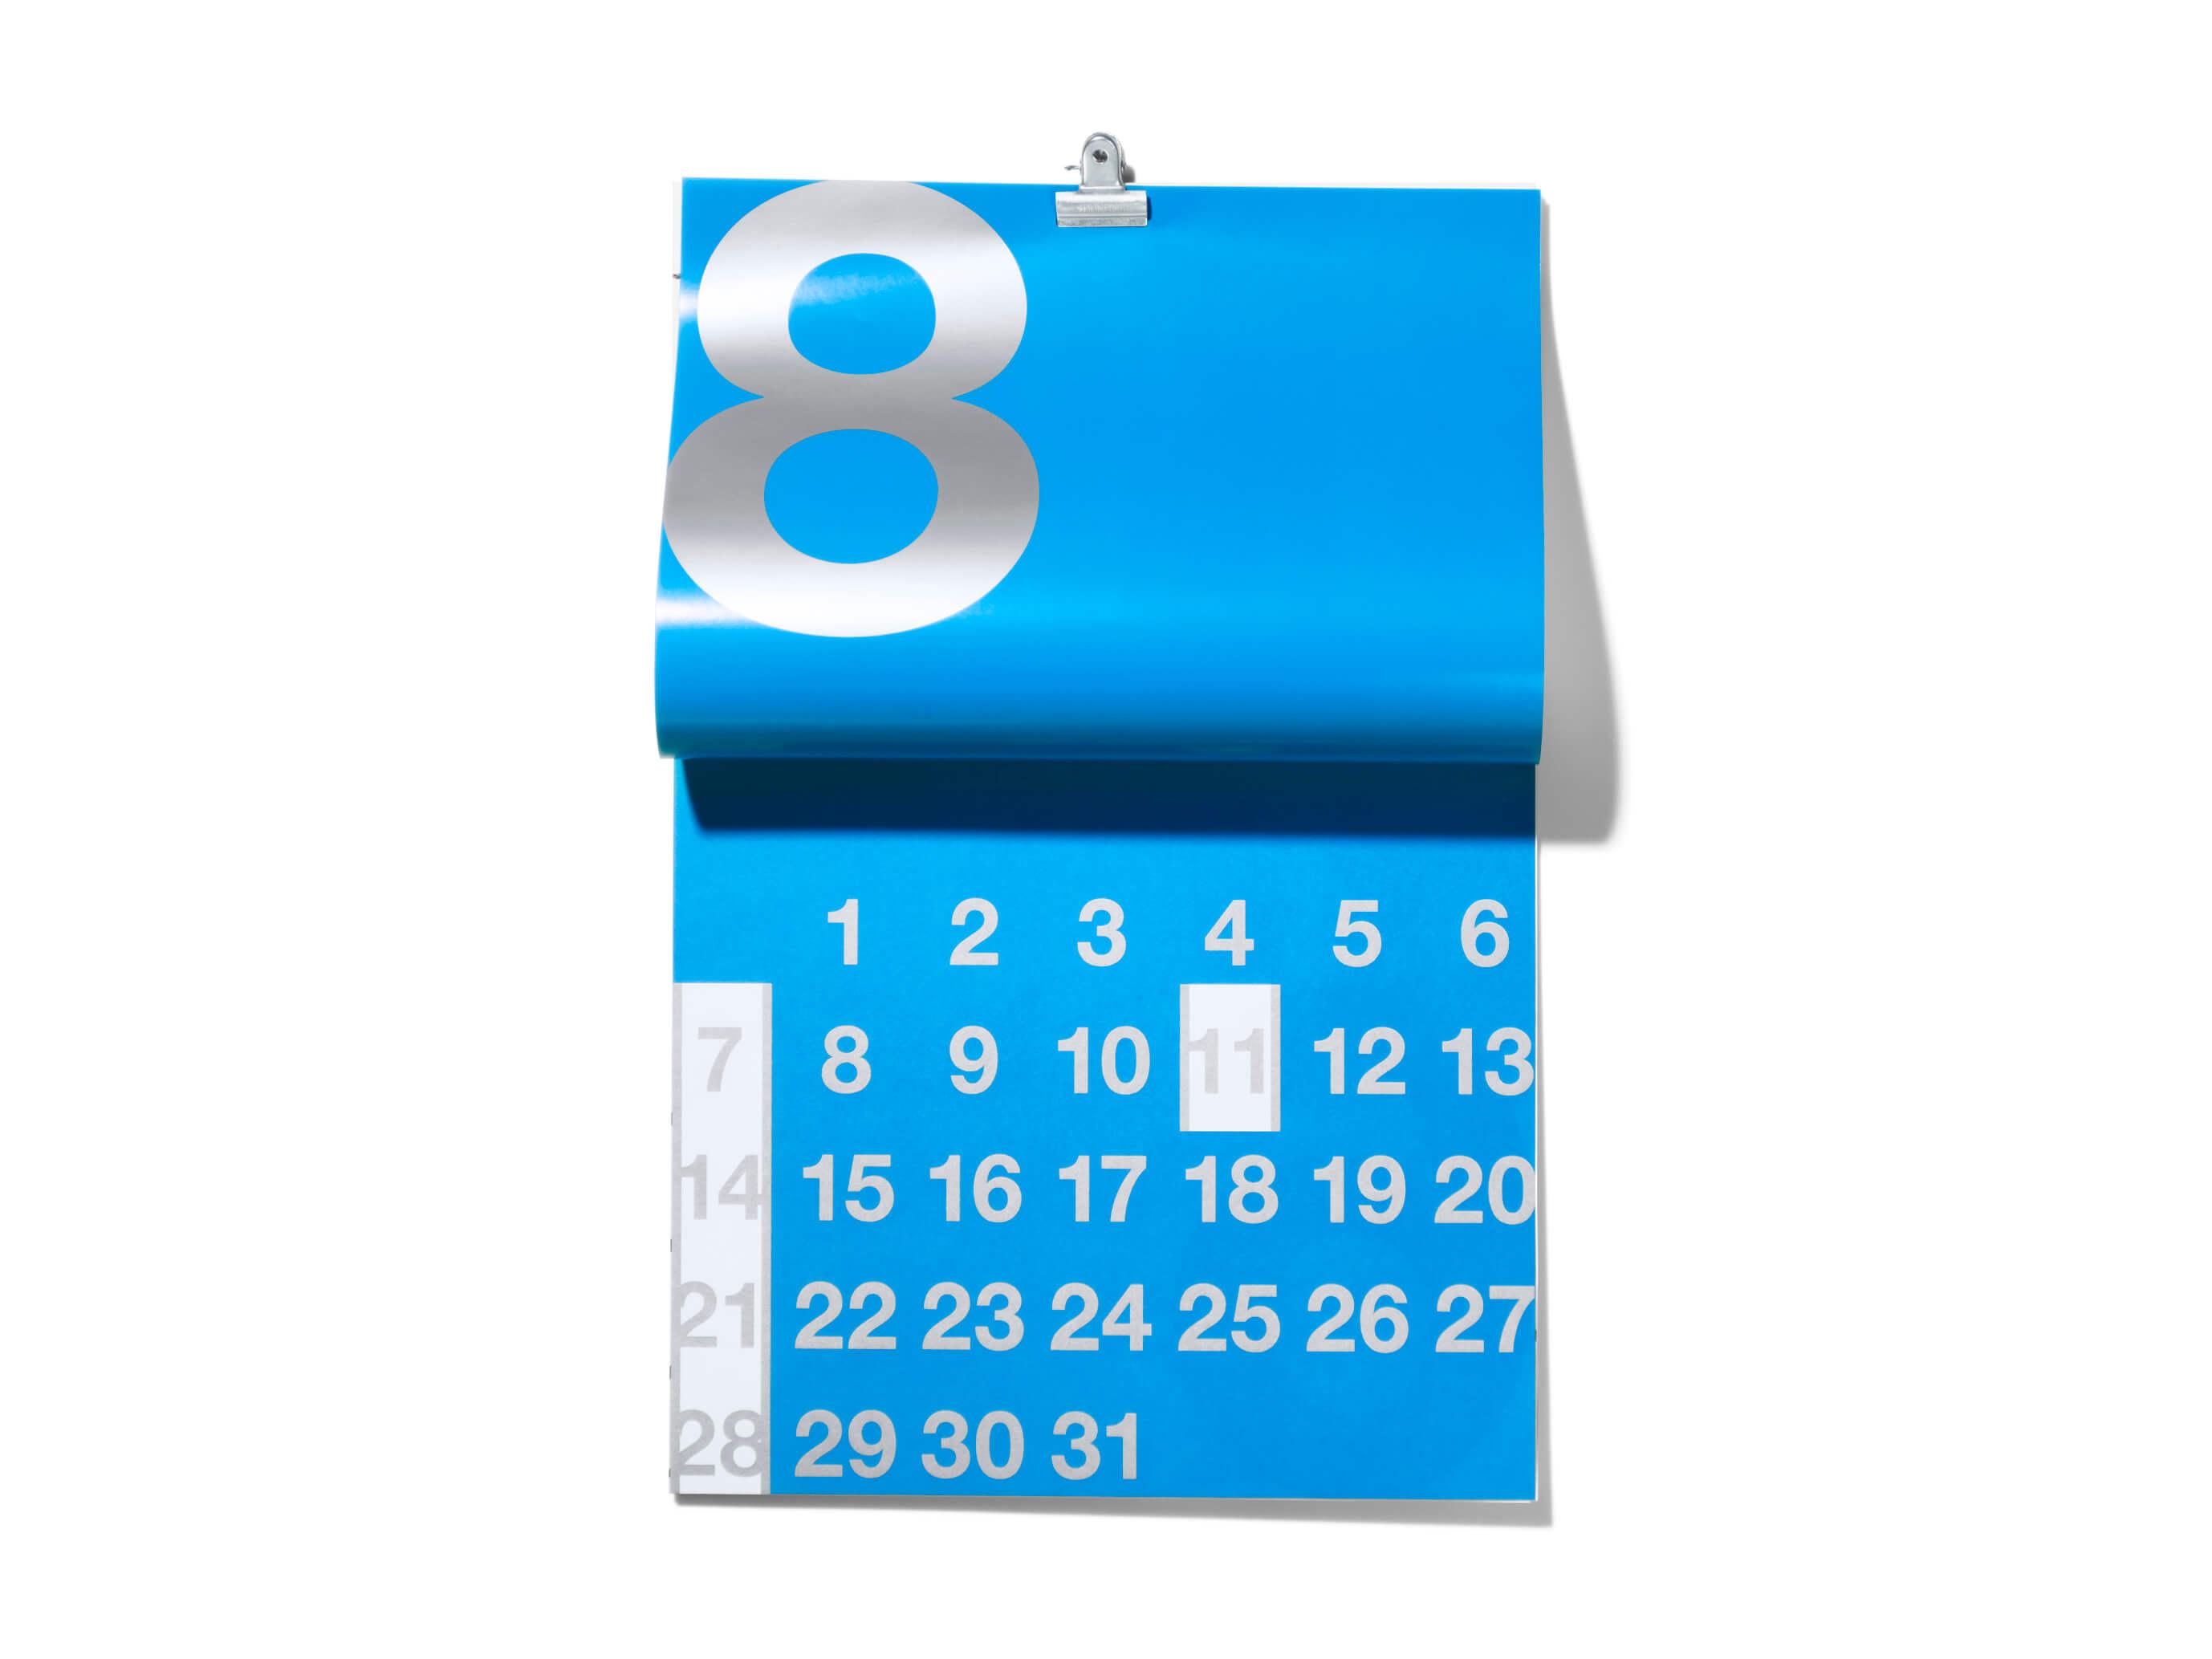 D-BROSカレンダー(2015) R.Uehara